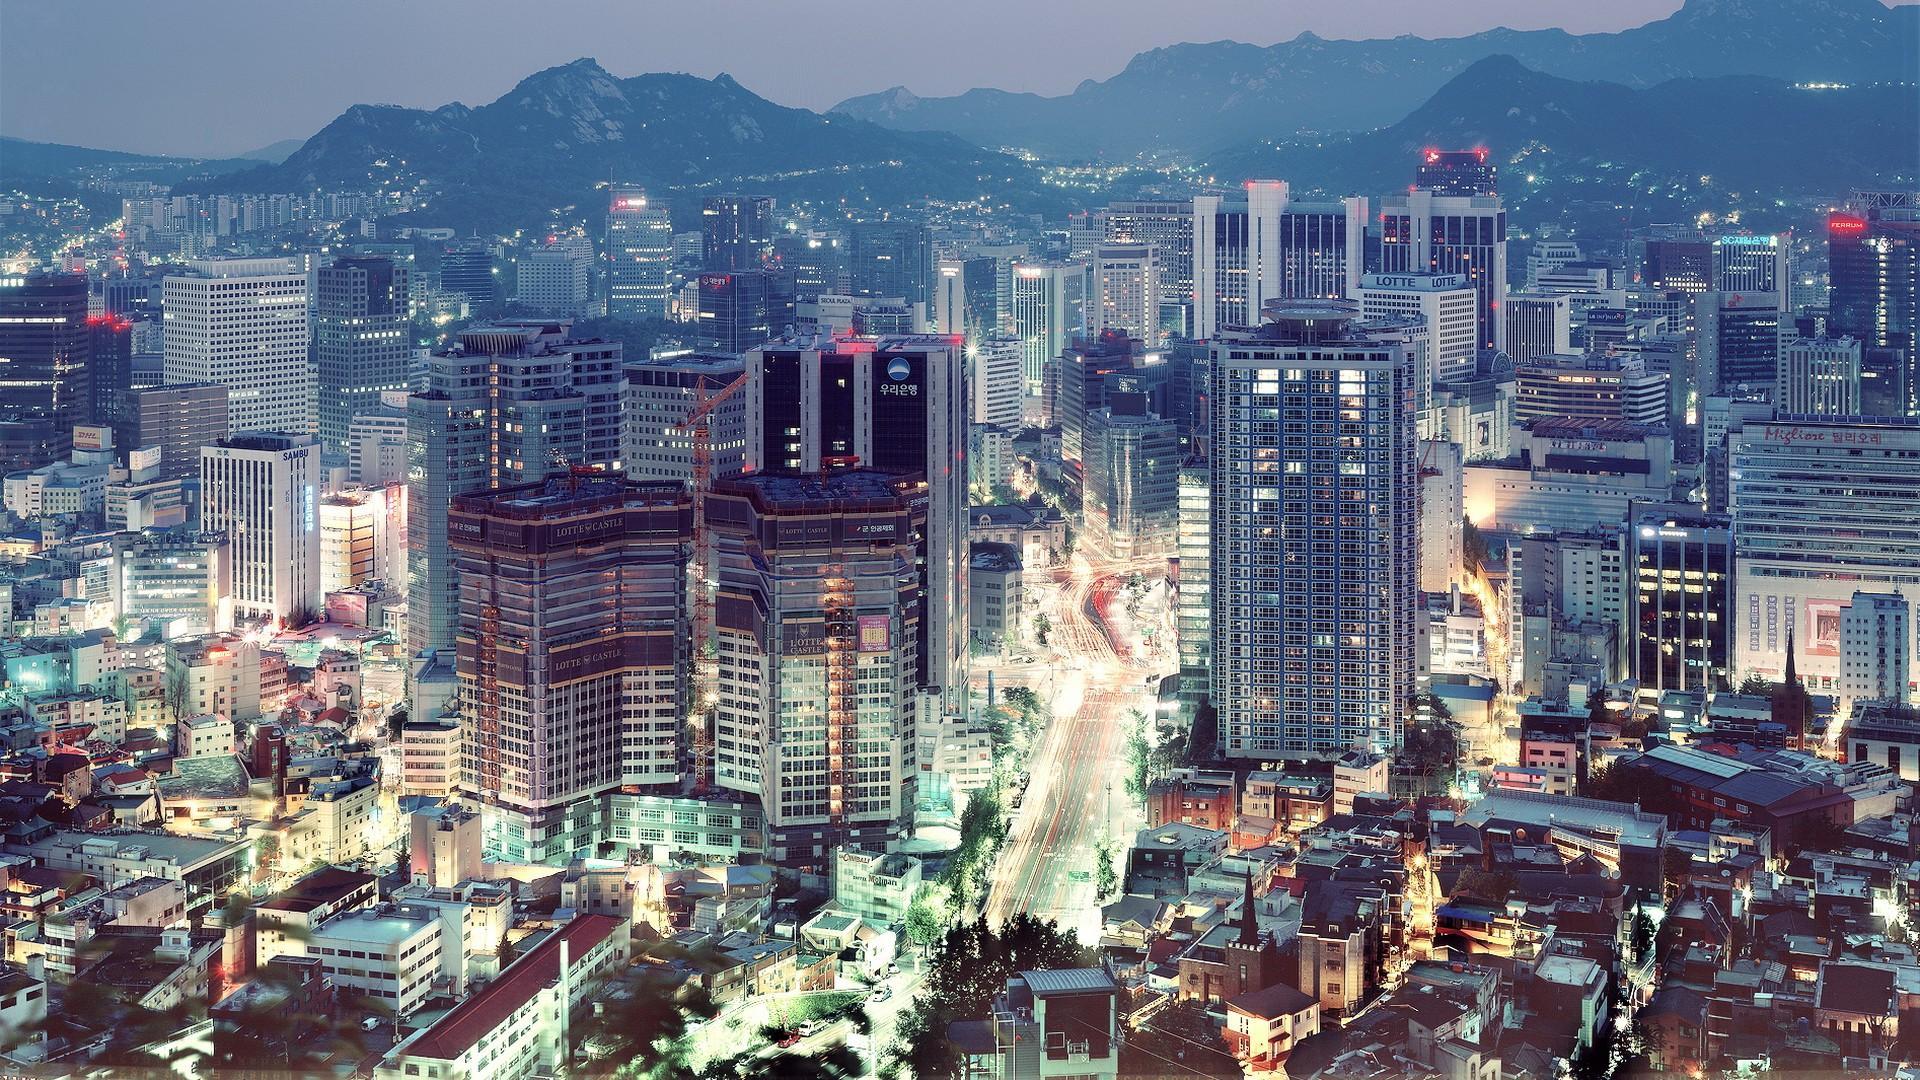 Wallpaper seoul south korea cityscape city apartments mountains house 1920x1080 - South korea wallpaper hd ...